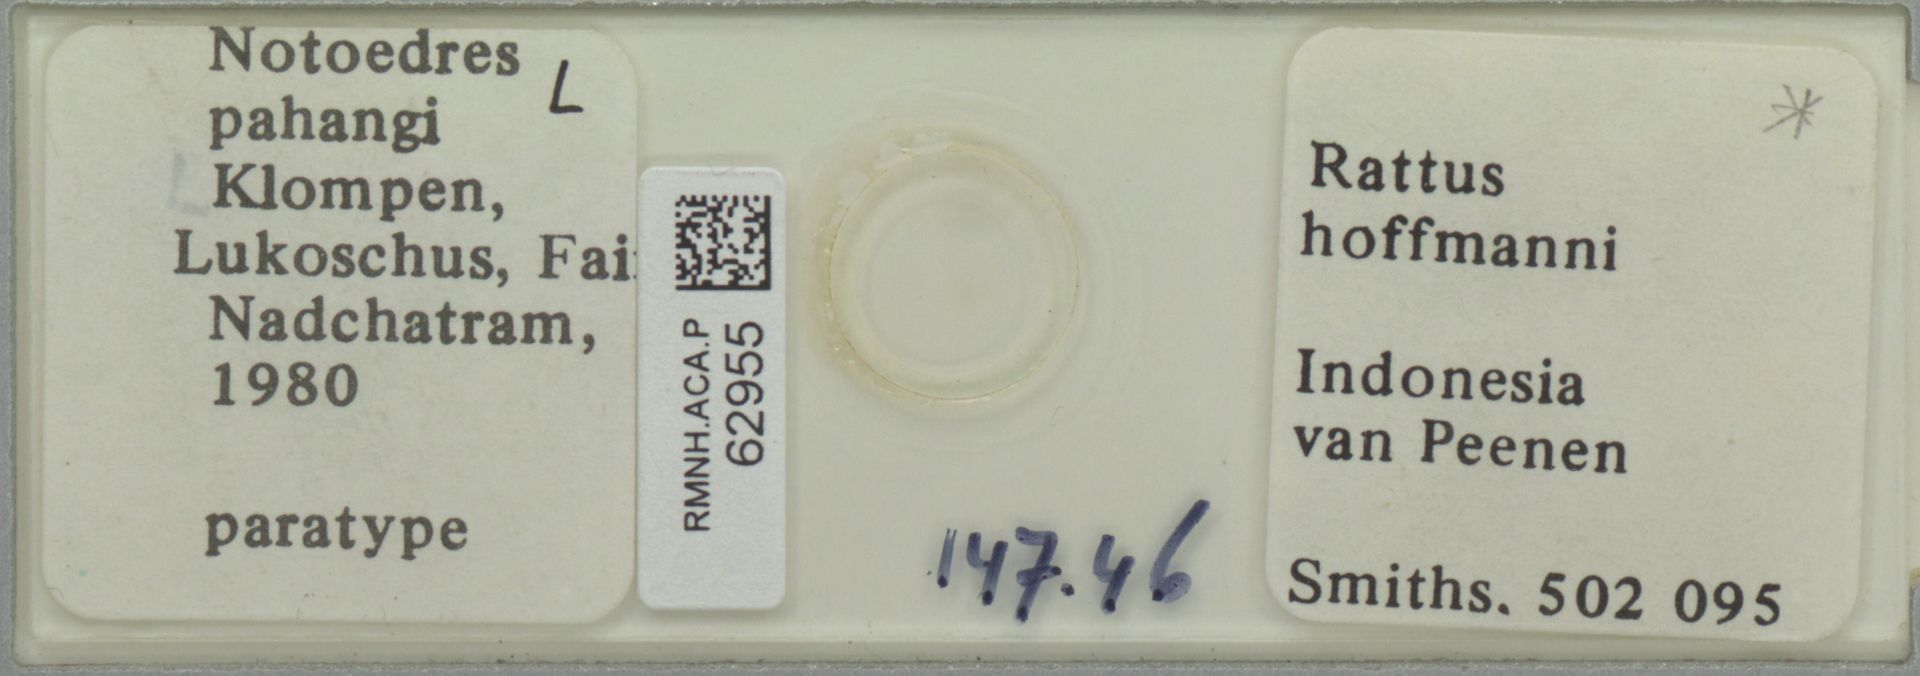 RMNH.ACA.P.62955   Notoedres pahangi Klompen, Lukoschus, Fain & Nadchatram, 1980